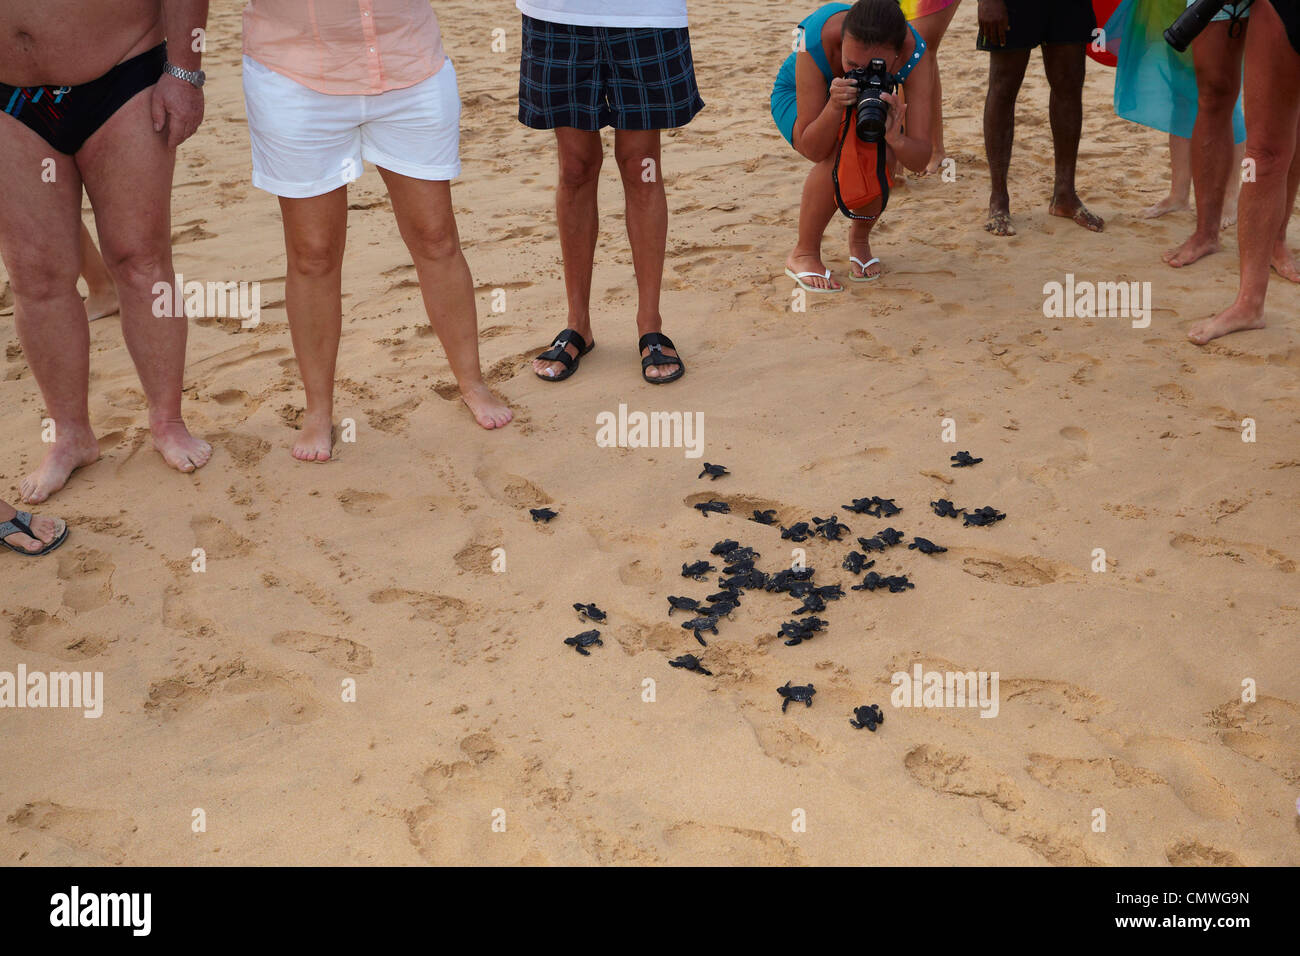 Sri Lanka - Koggala beach, village near Galle, young turtles hatchery realised into the ocean - Stock Image